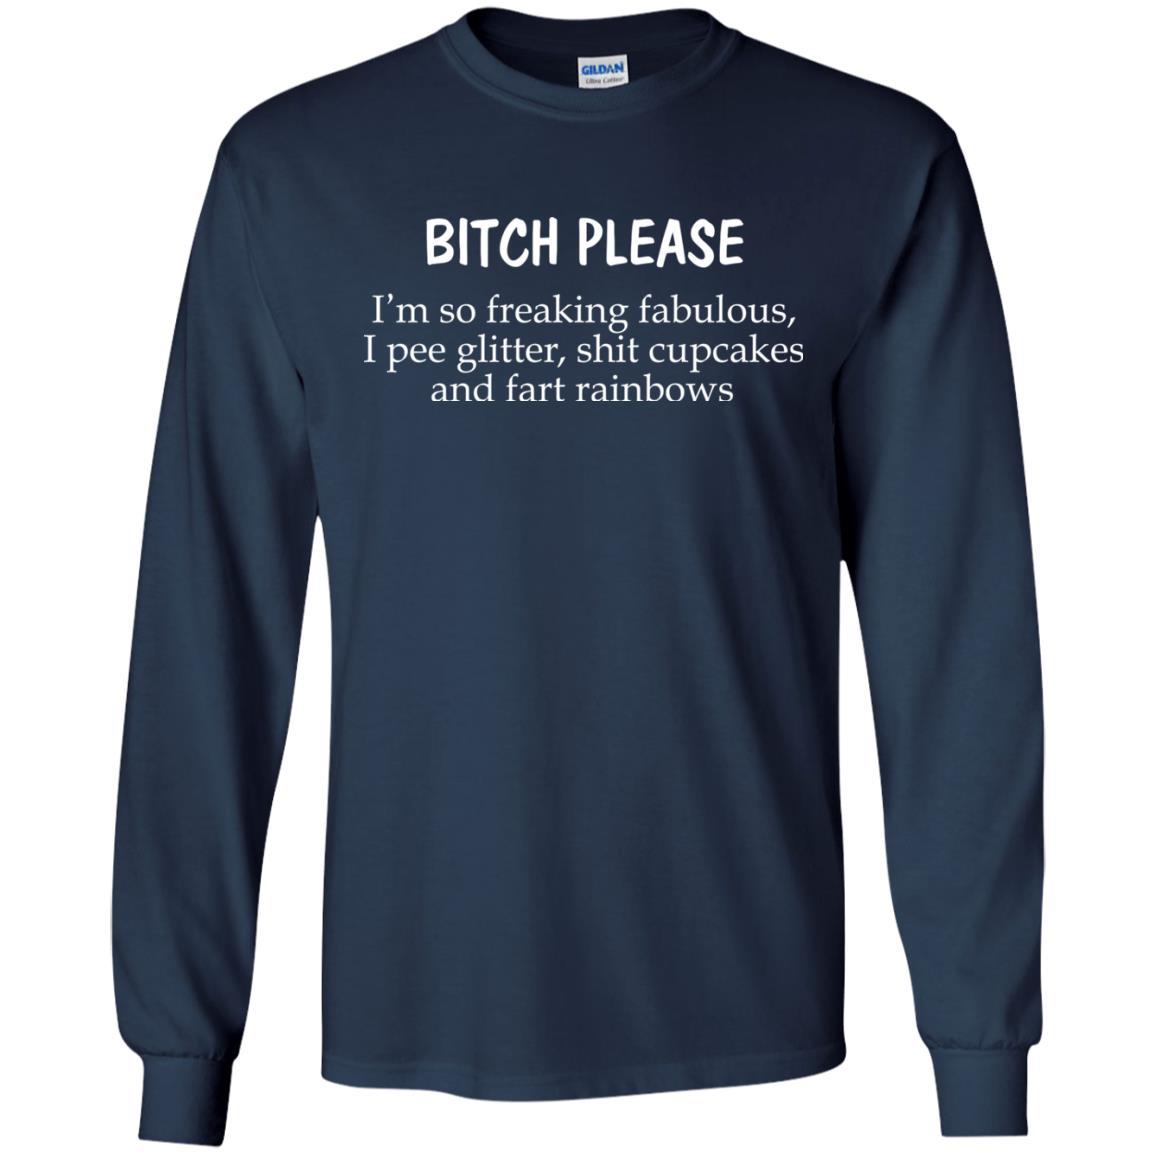 image 1245 - Bitch Please I'm so freaking fabulous t-shirt, sweater